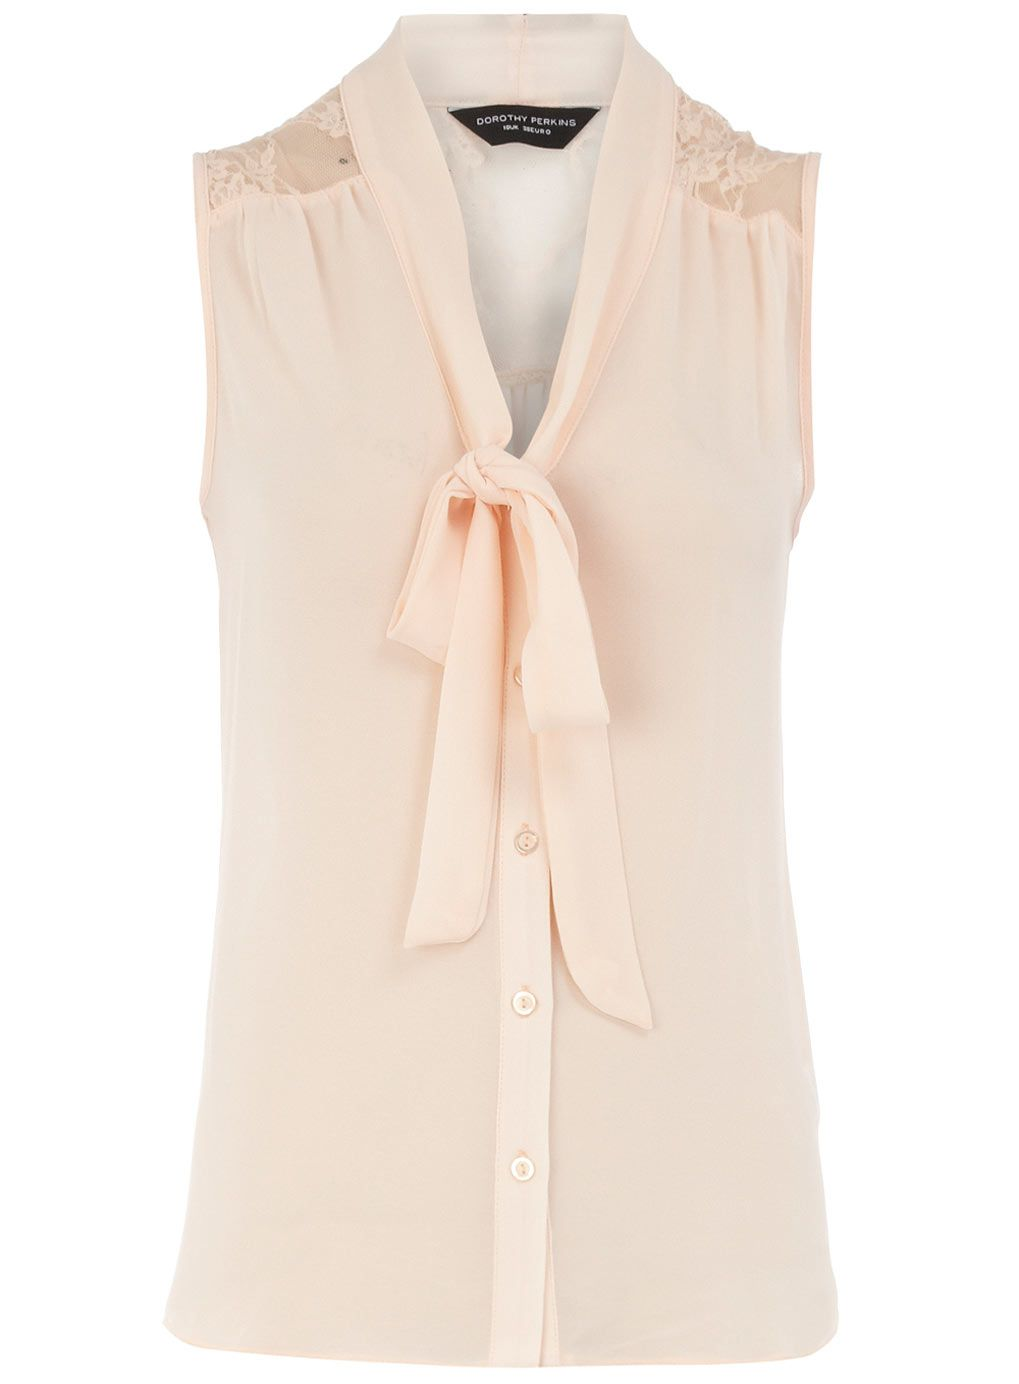 f3d4e11e82dcad dorothy perkins pink lace yoke blouse | dress - s/s | Pink lace tops ...